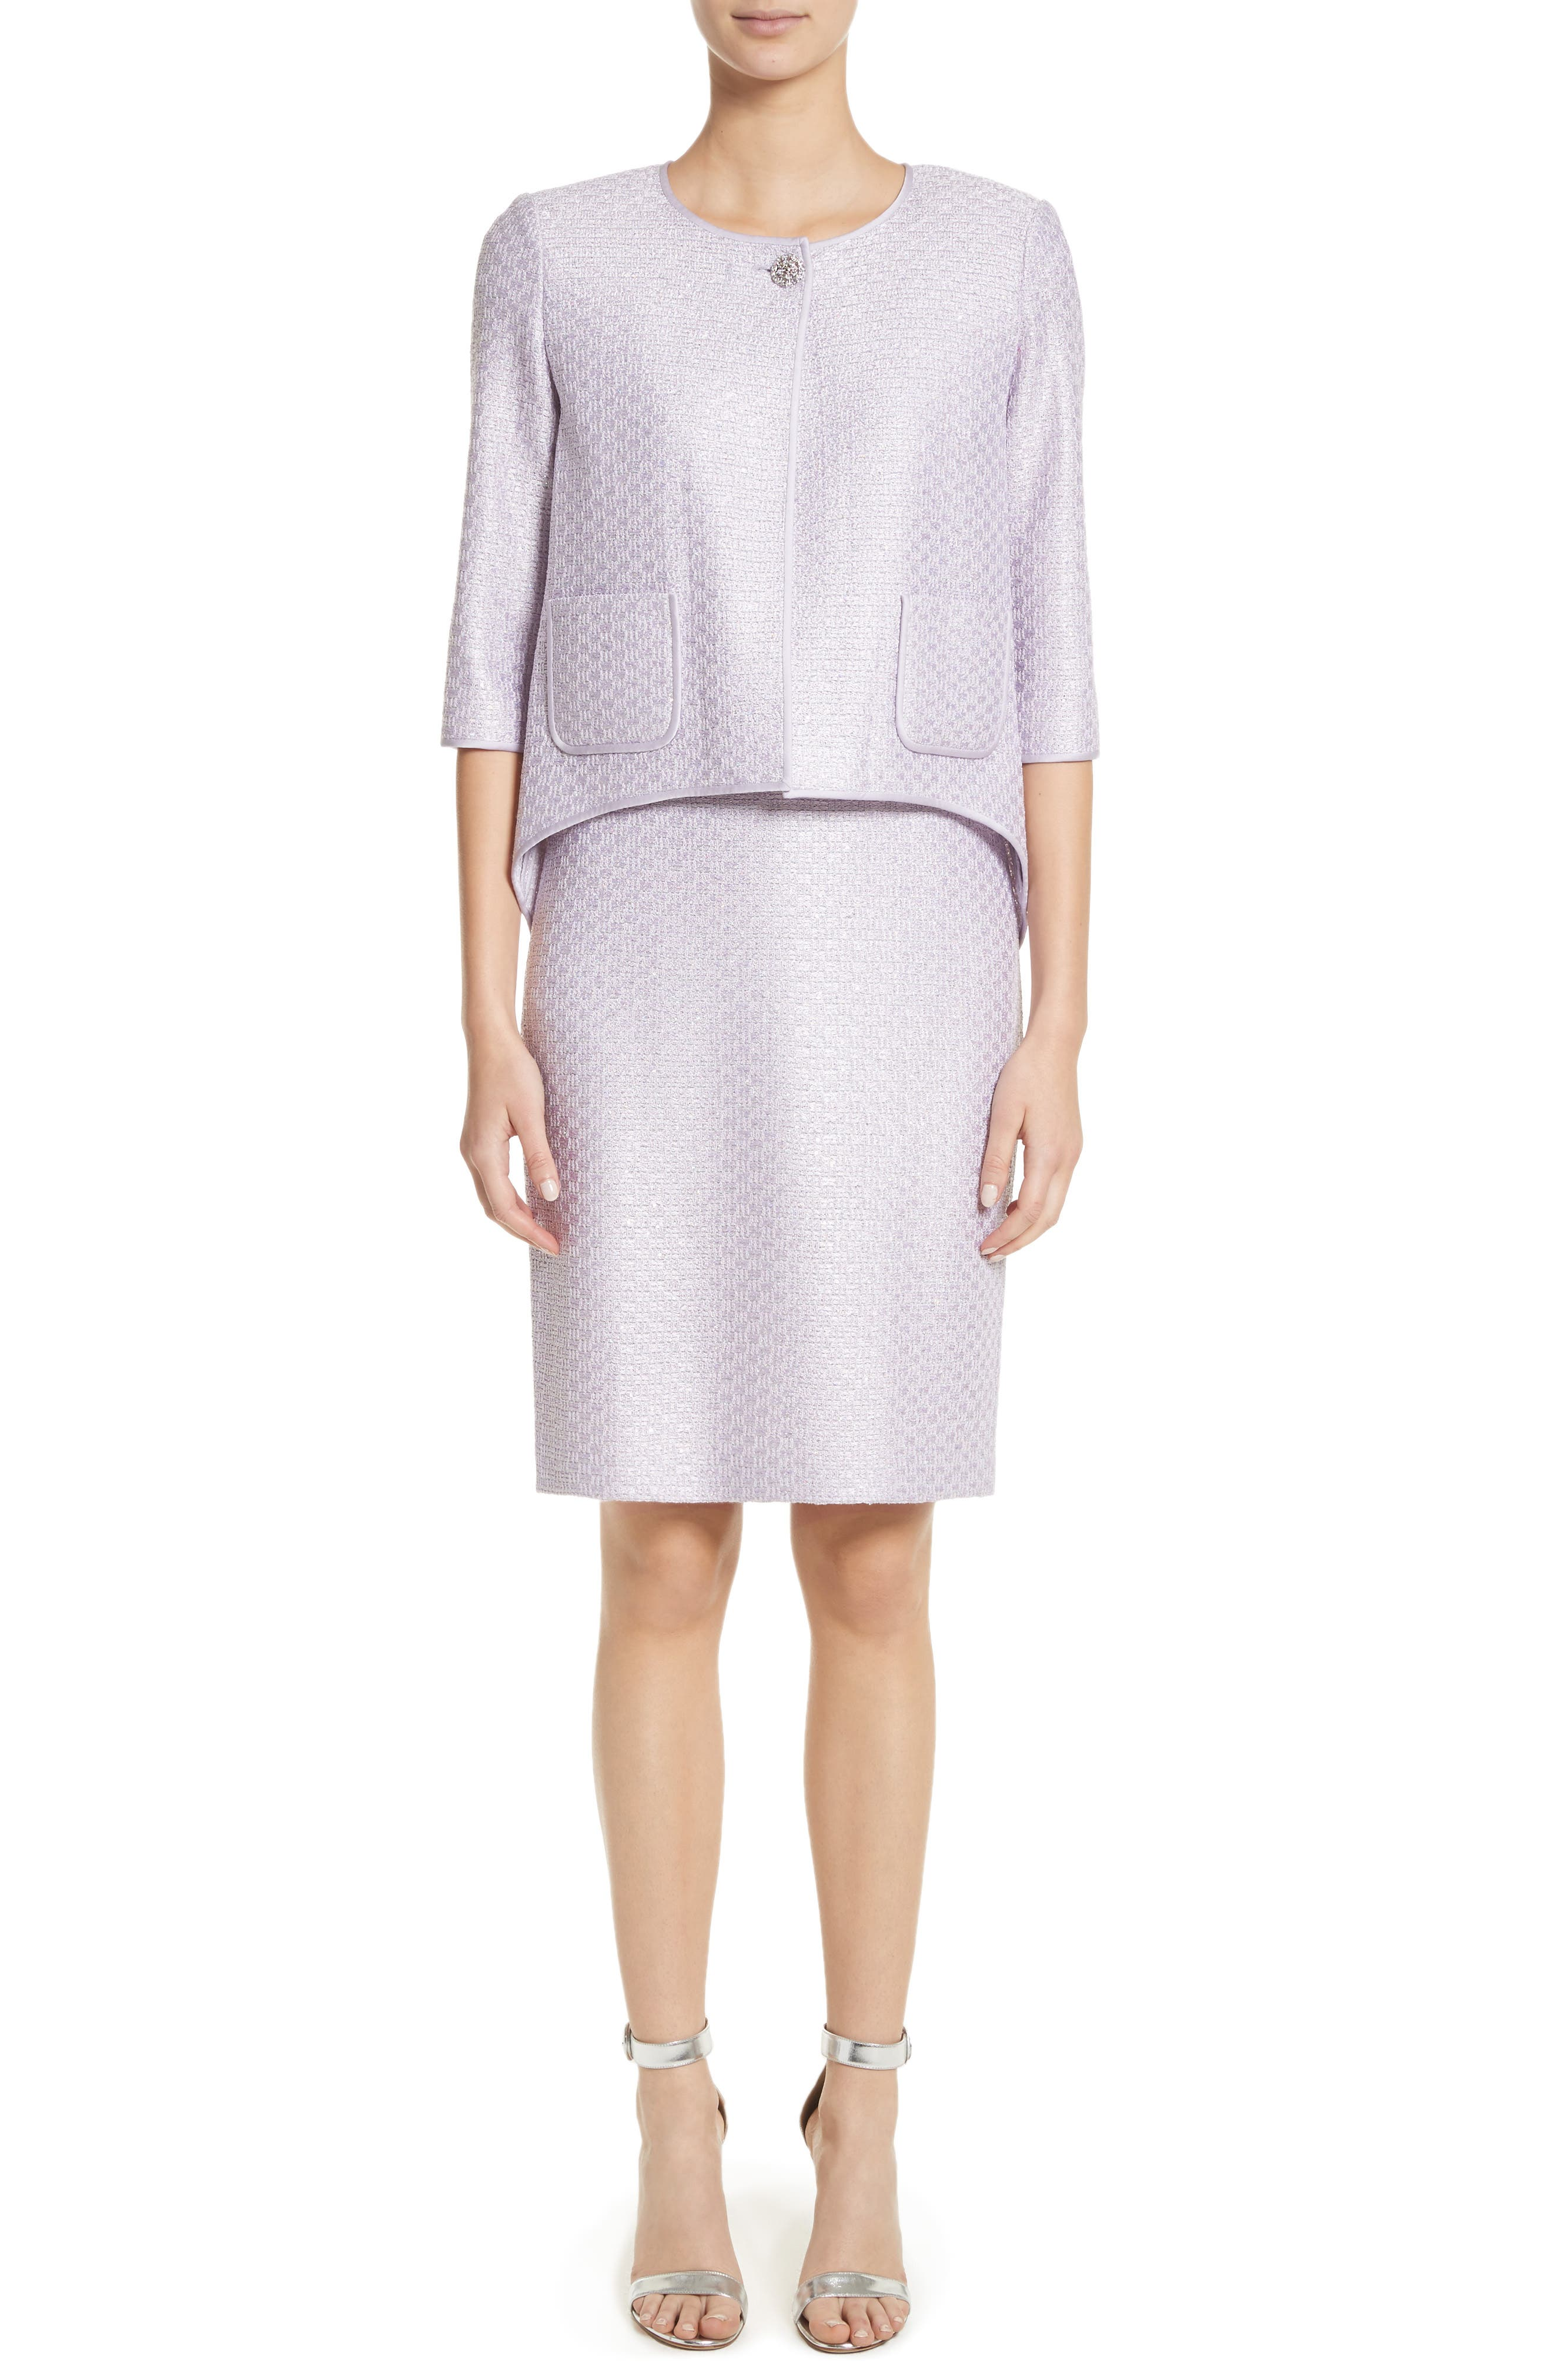 Hansh Sequin Knit Pencil Skirt,                             Alternate thumbnail 8, color,                             Lilac Multi